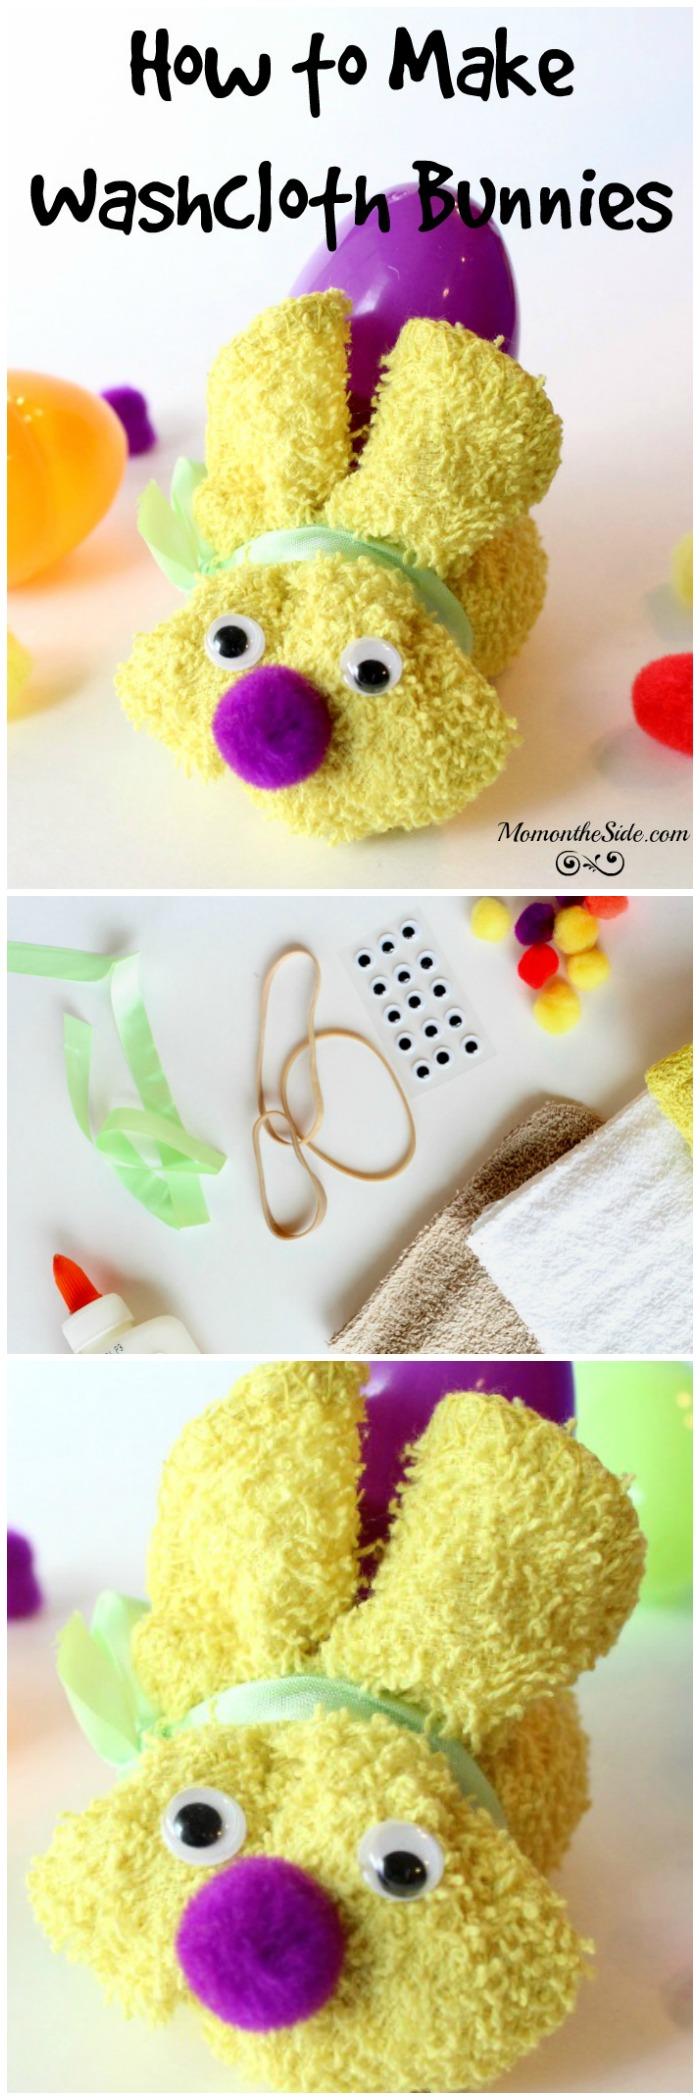 How to Make Washcloth Bunnies